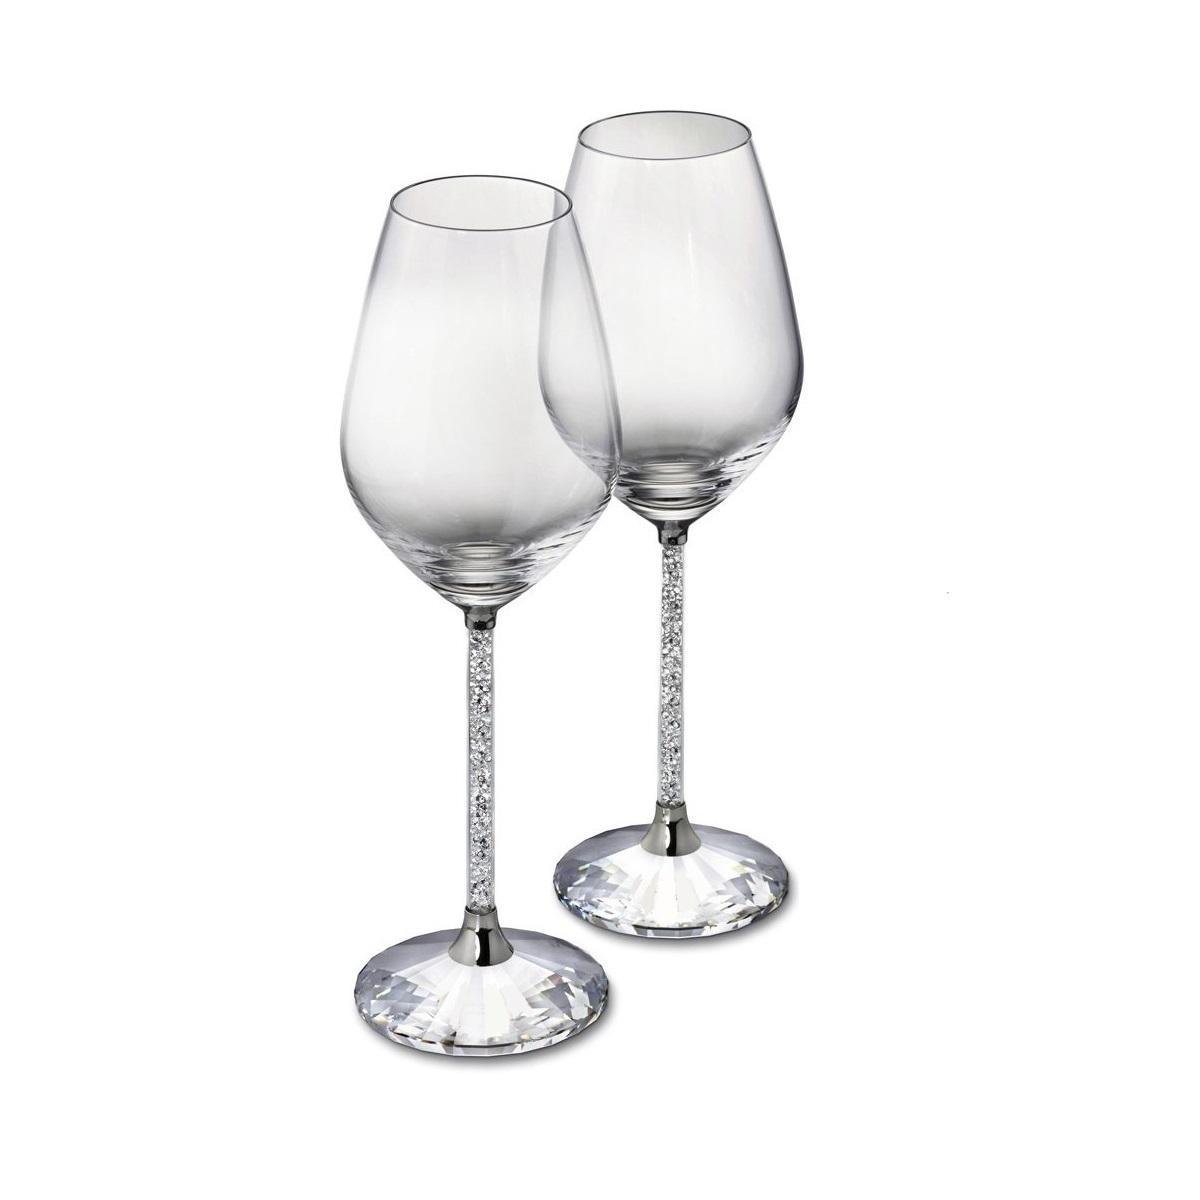 618cf396e89 Pair of Swarovski Crystal Filled Stem Wine Goblets - Diamond Affair